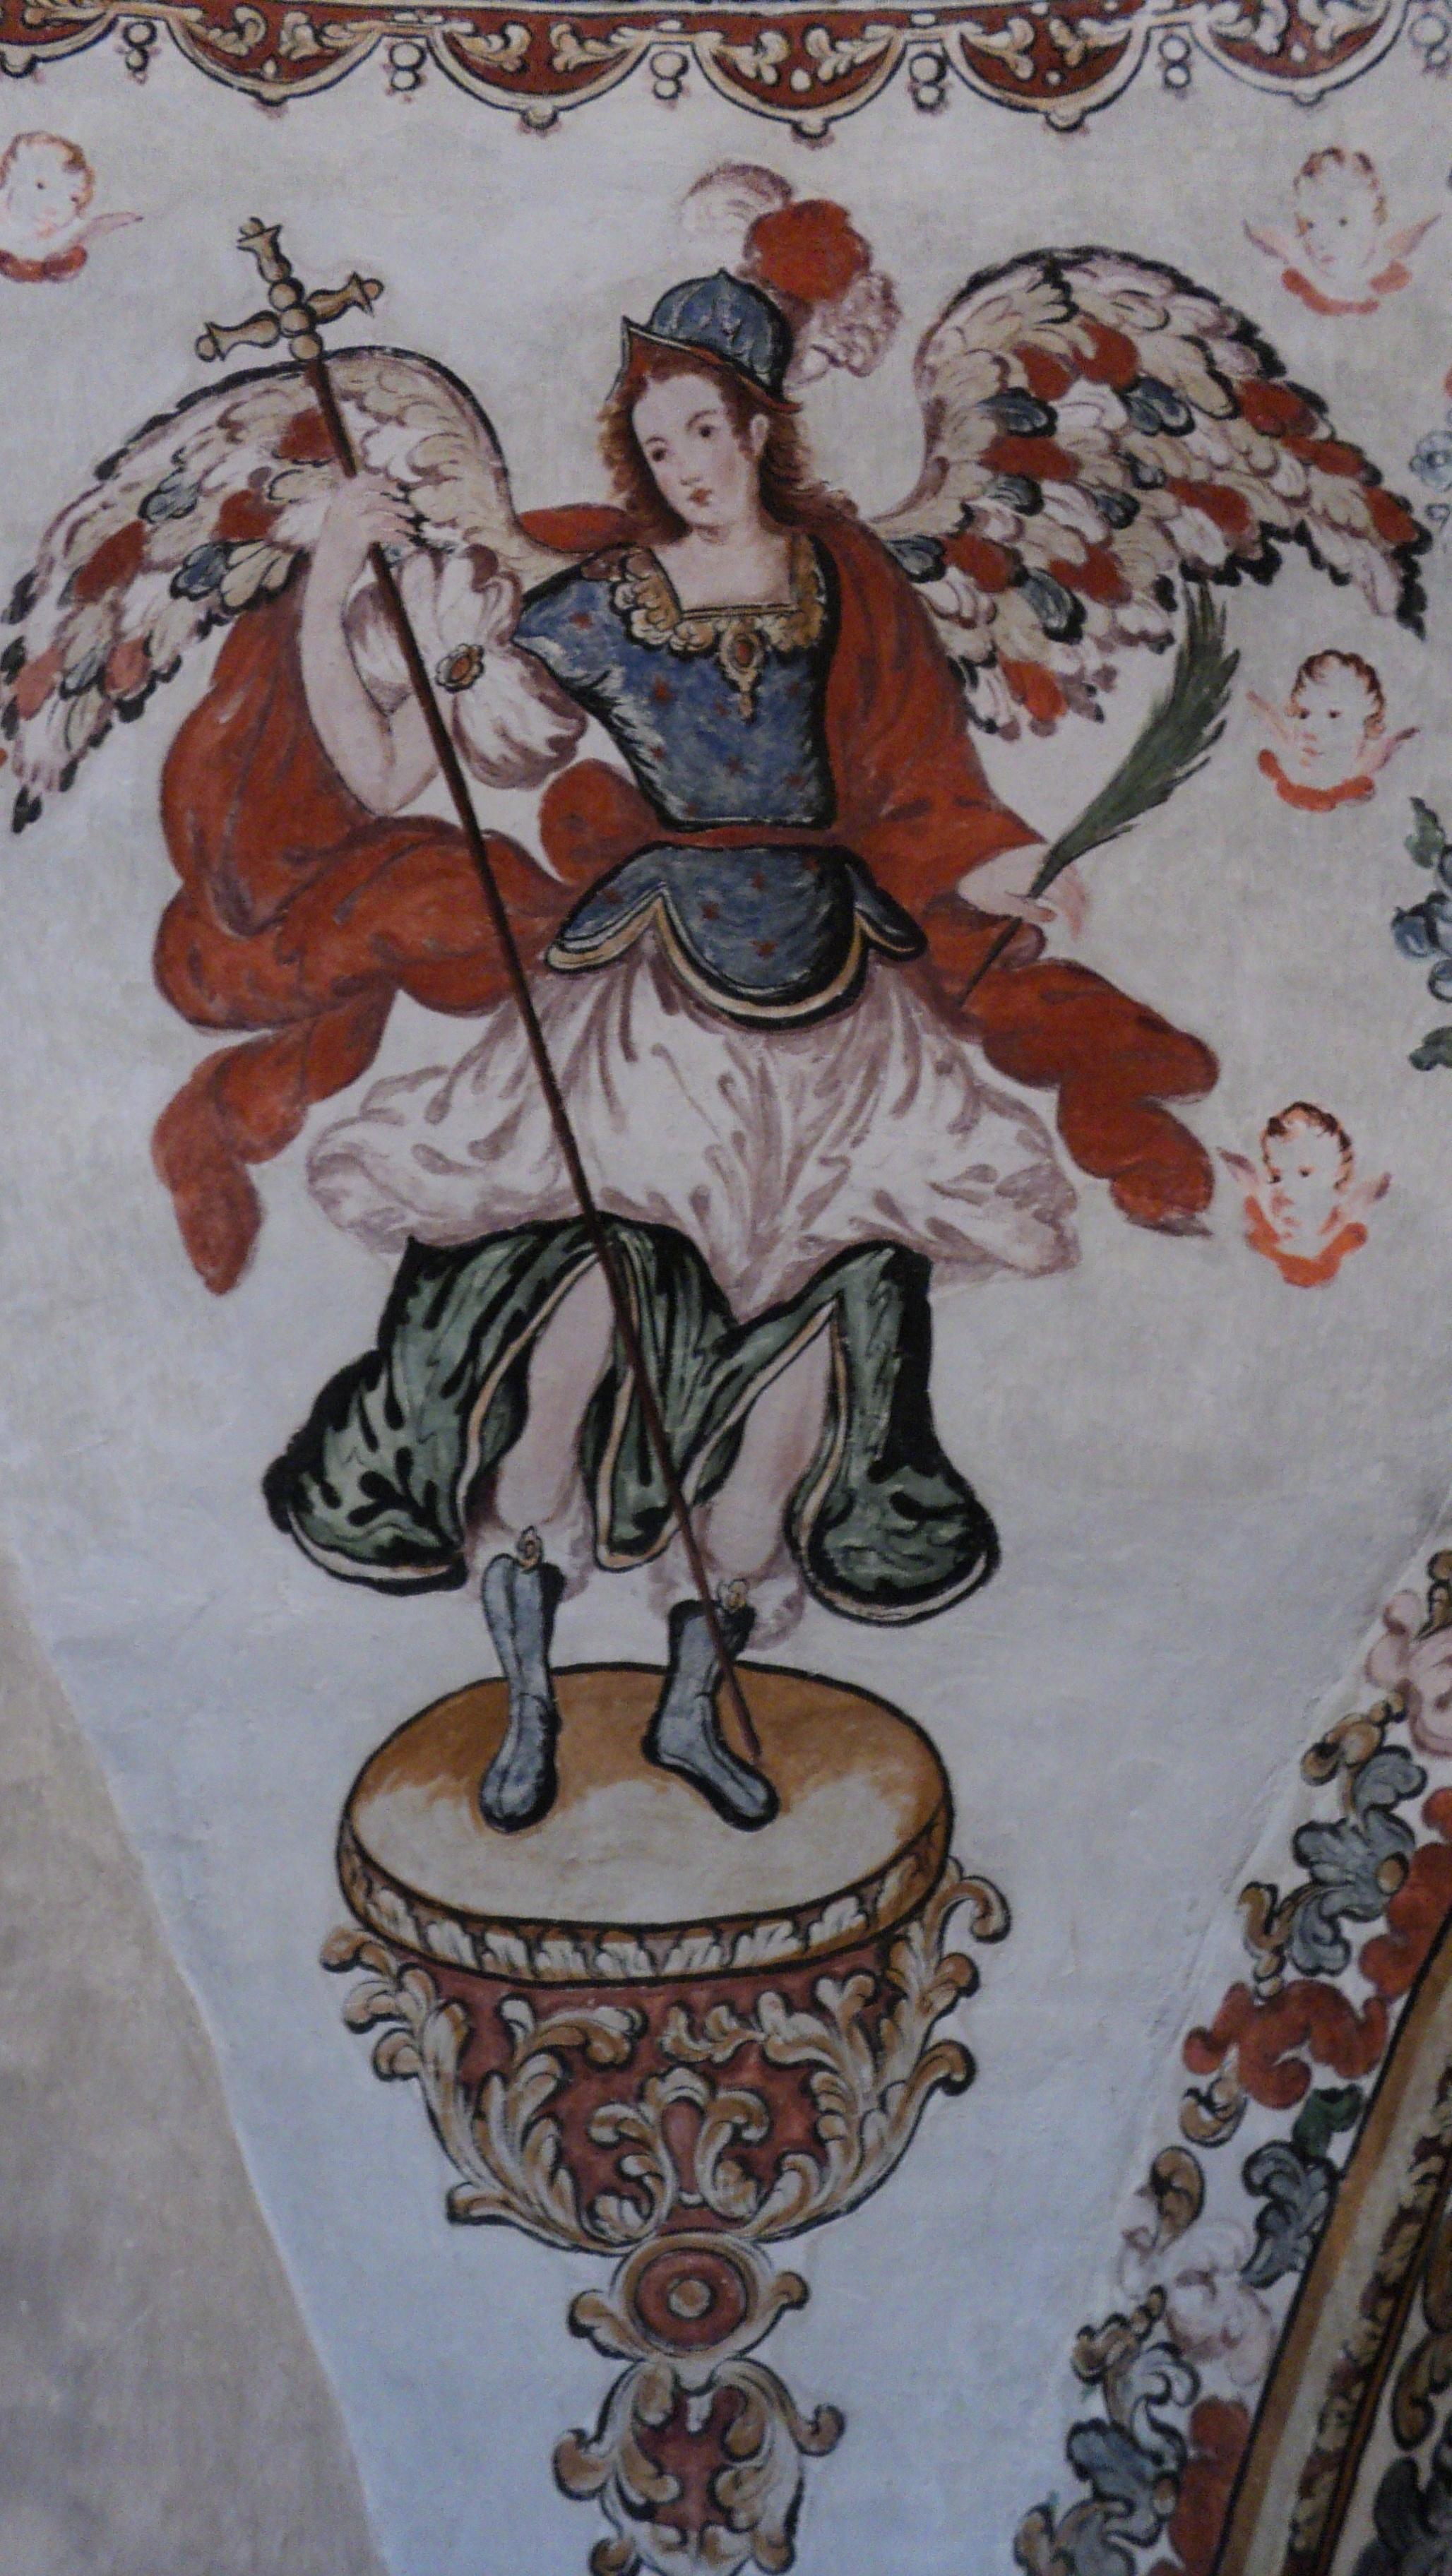 File mural religious painting oaxacadsc02269 jpg wikipedia for Christian mural paintings